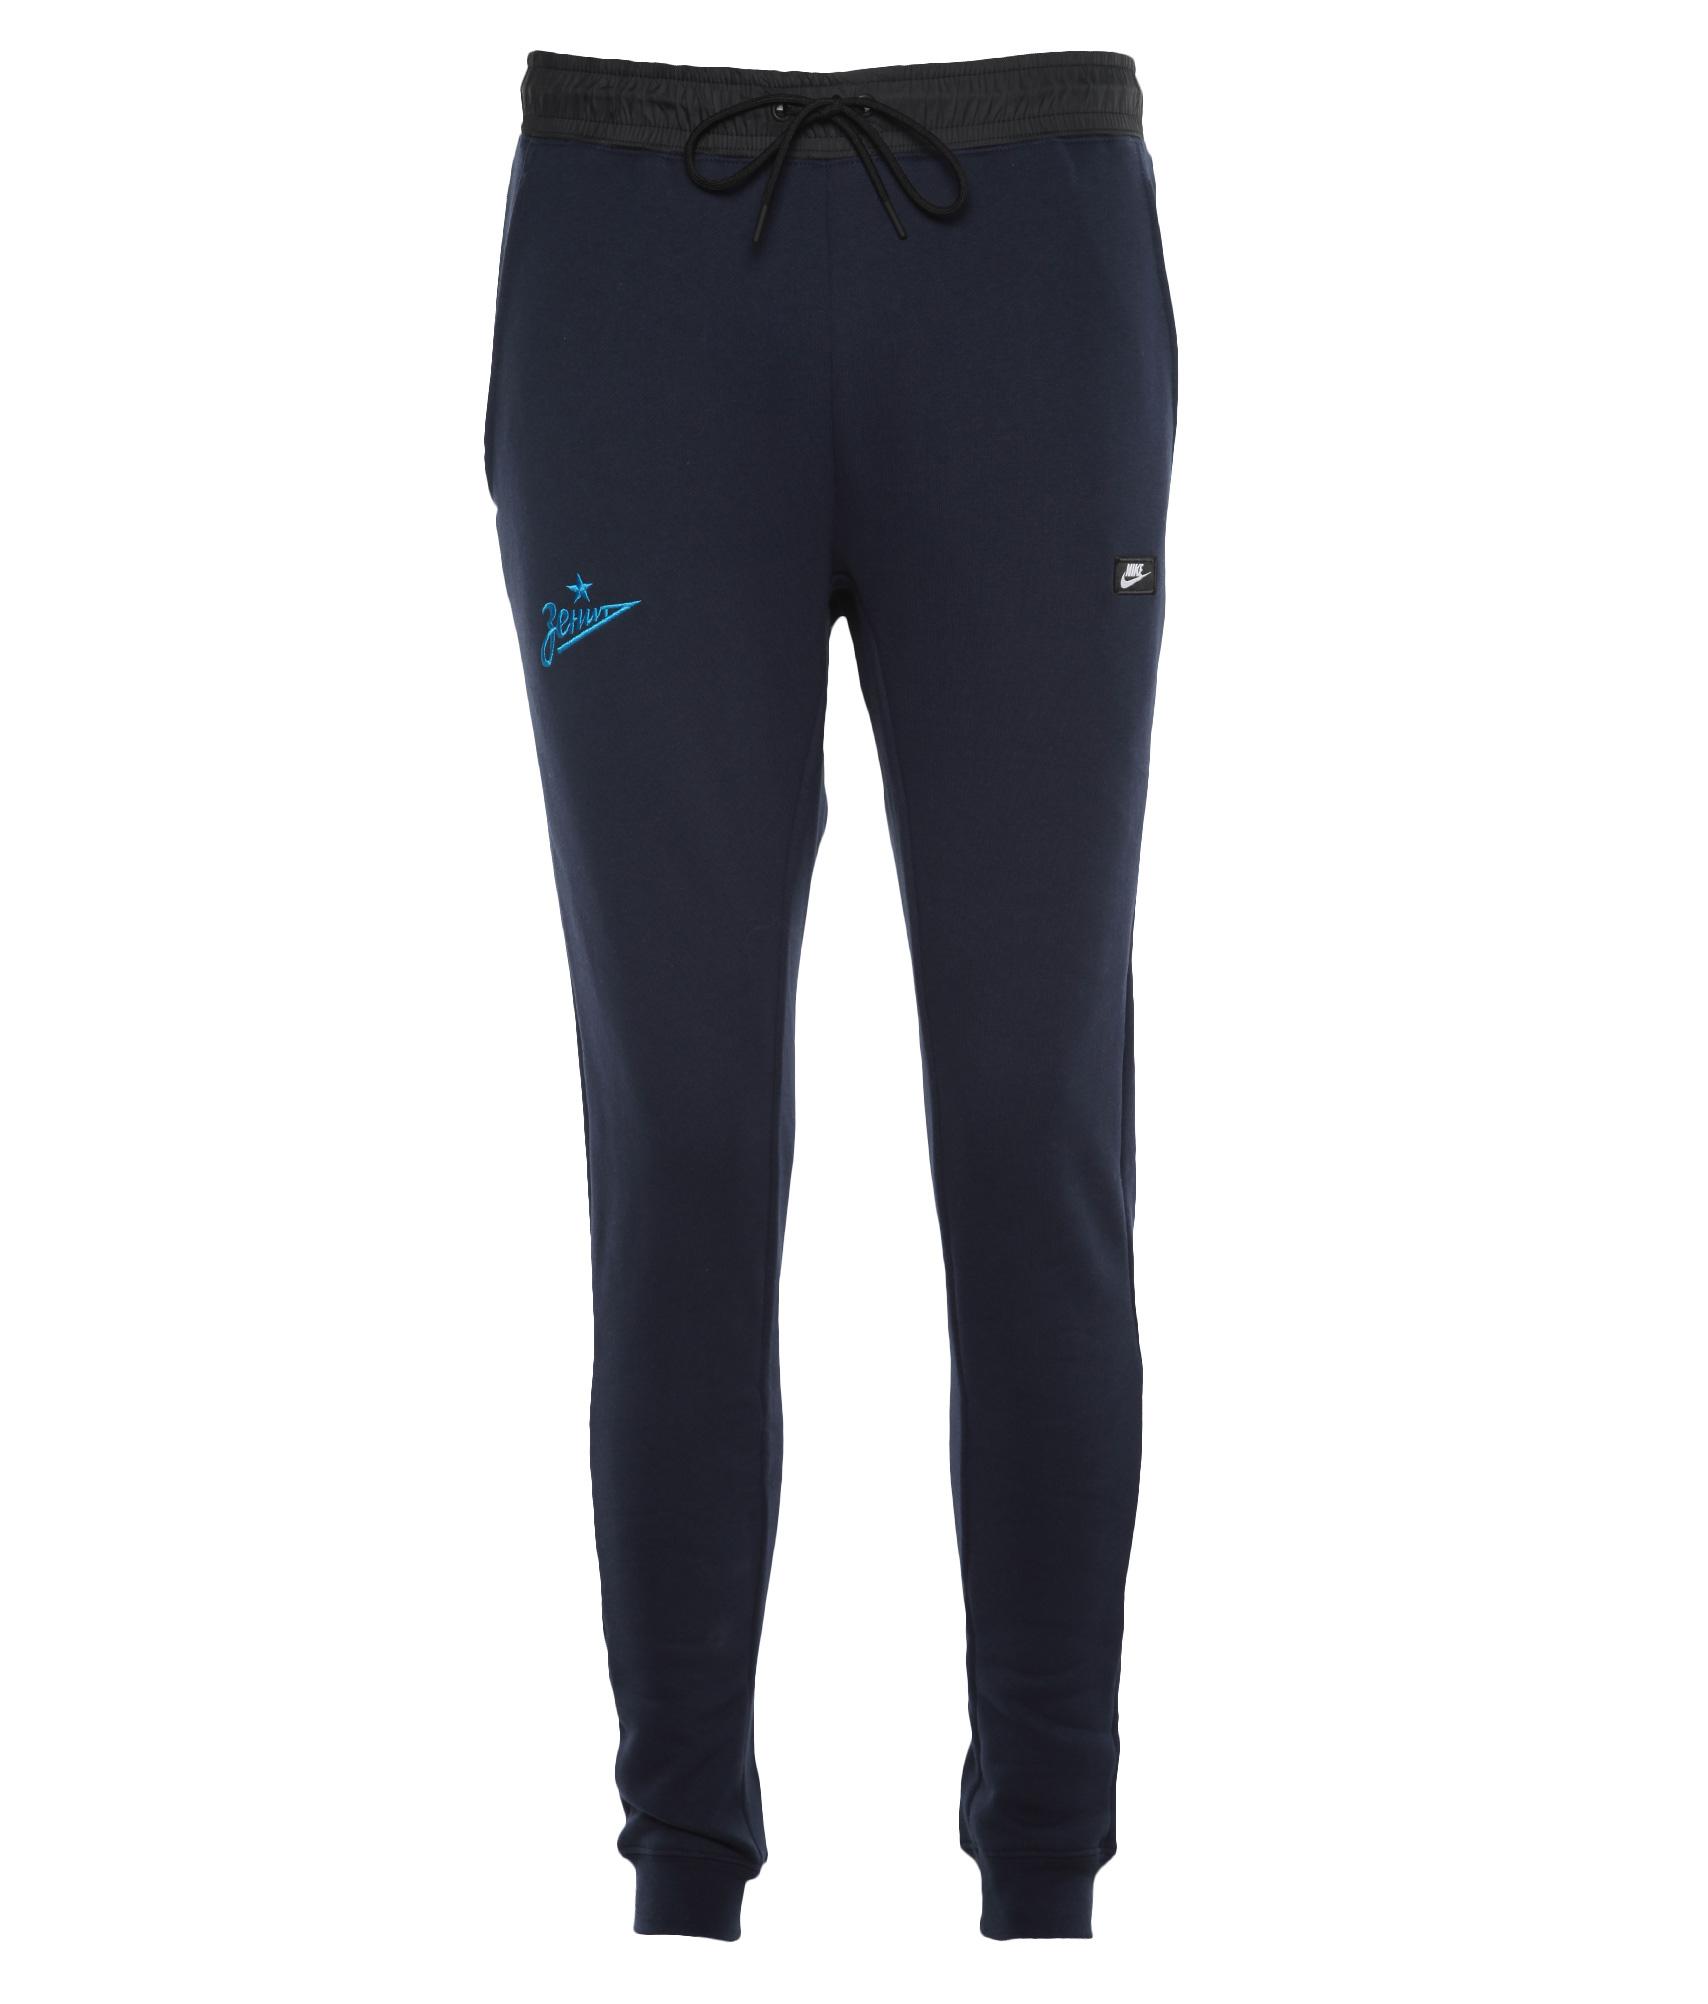 Брюки Nike, Цвет-Синий, Размер-L найк борзов найк борзов избранное ii